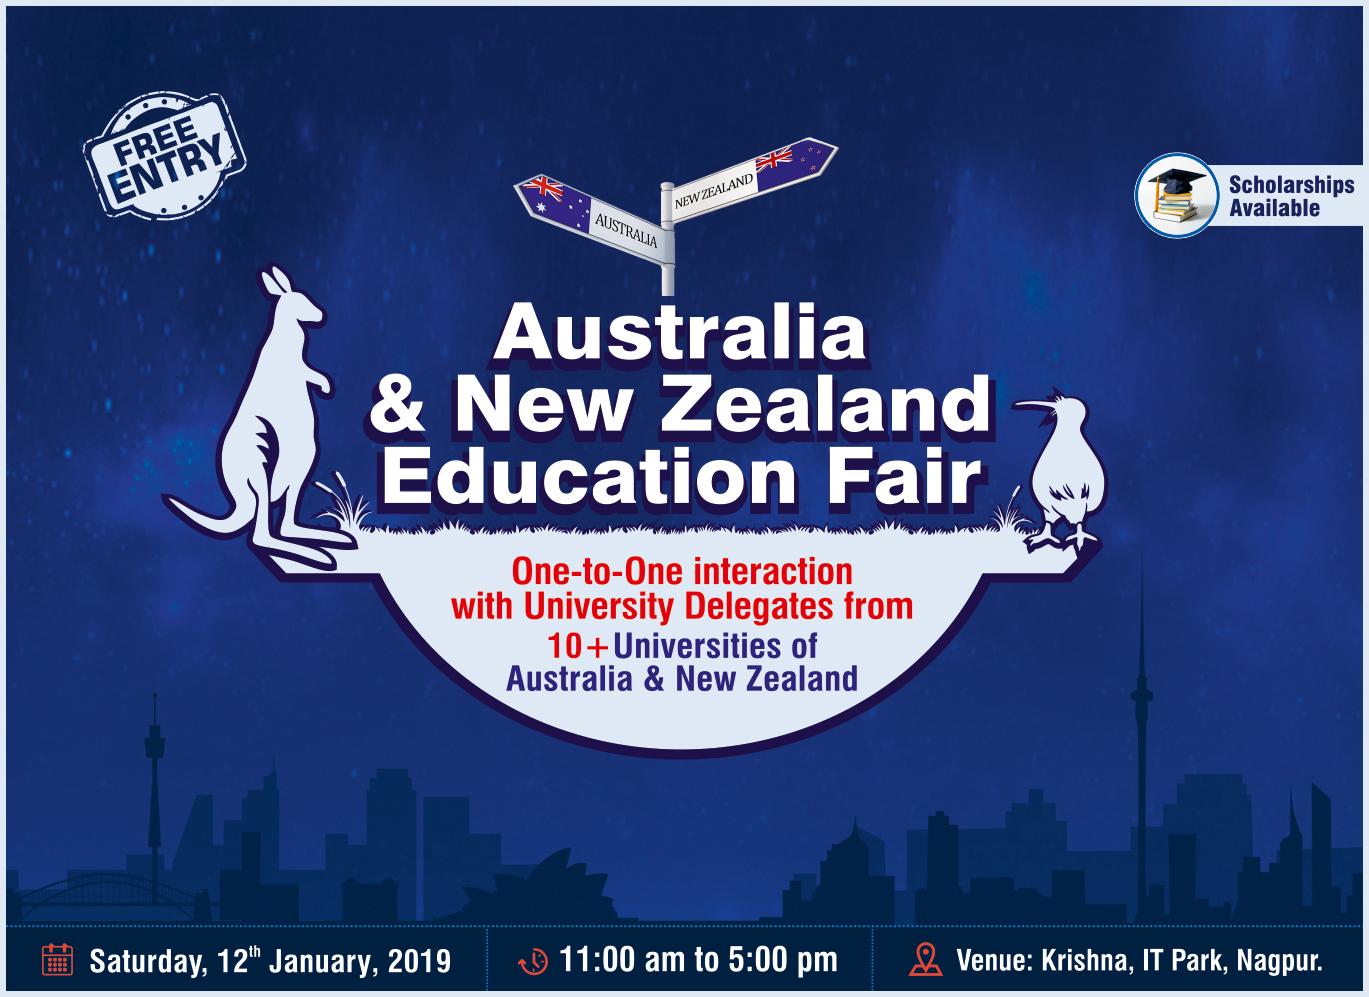 Australia New Zealand Education Fair - 12th January 2019